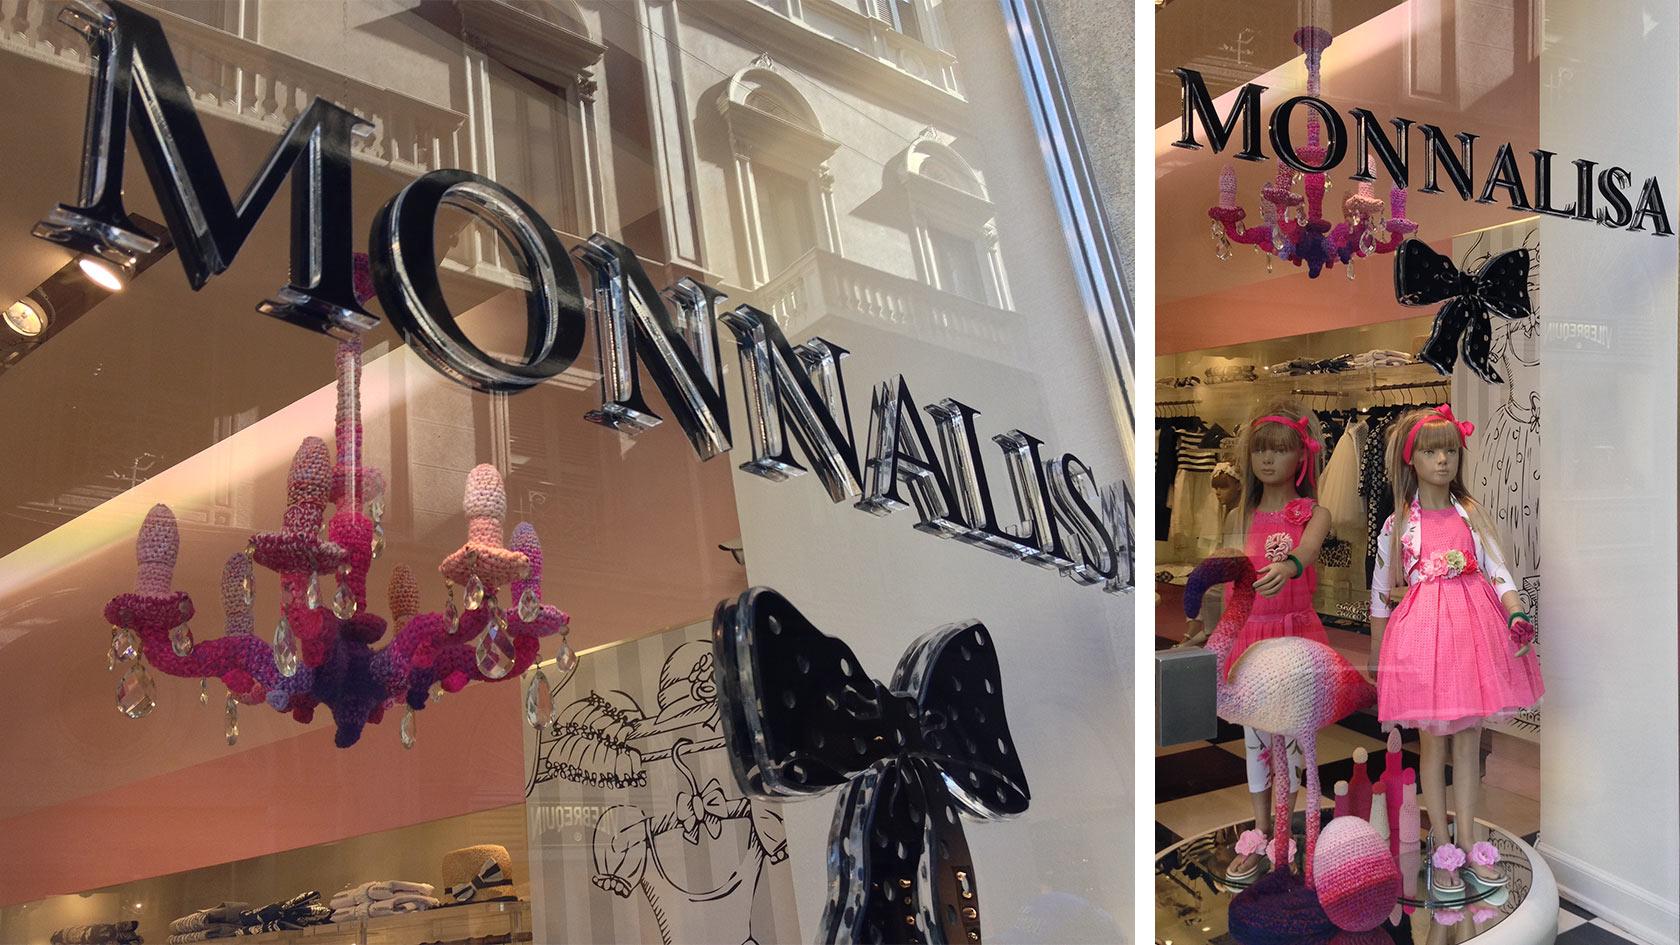 Monnalisa – via della Spiga Milano